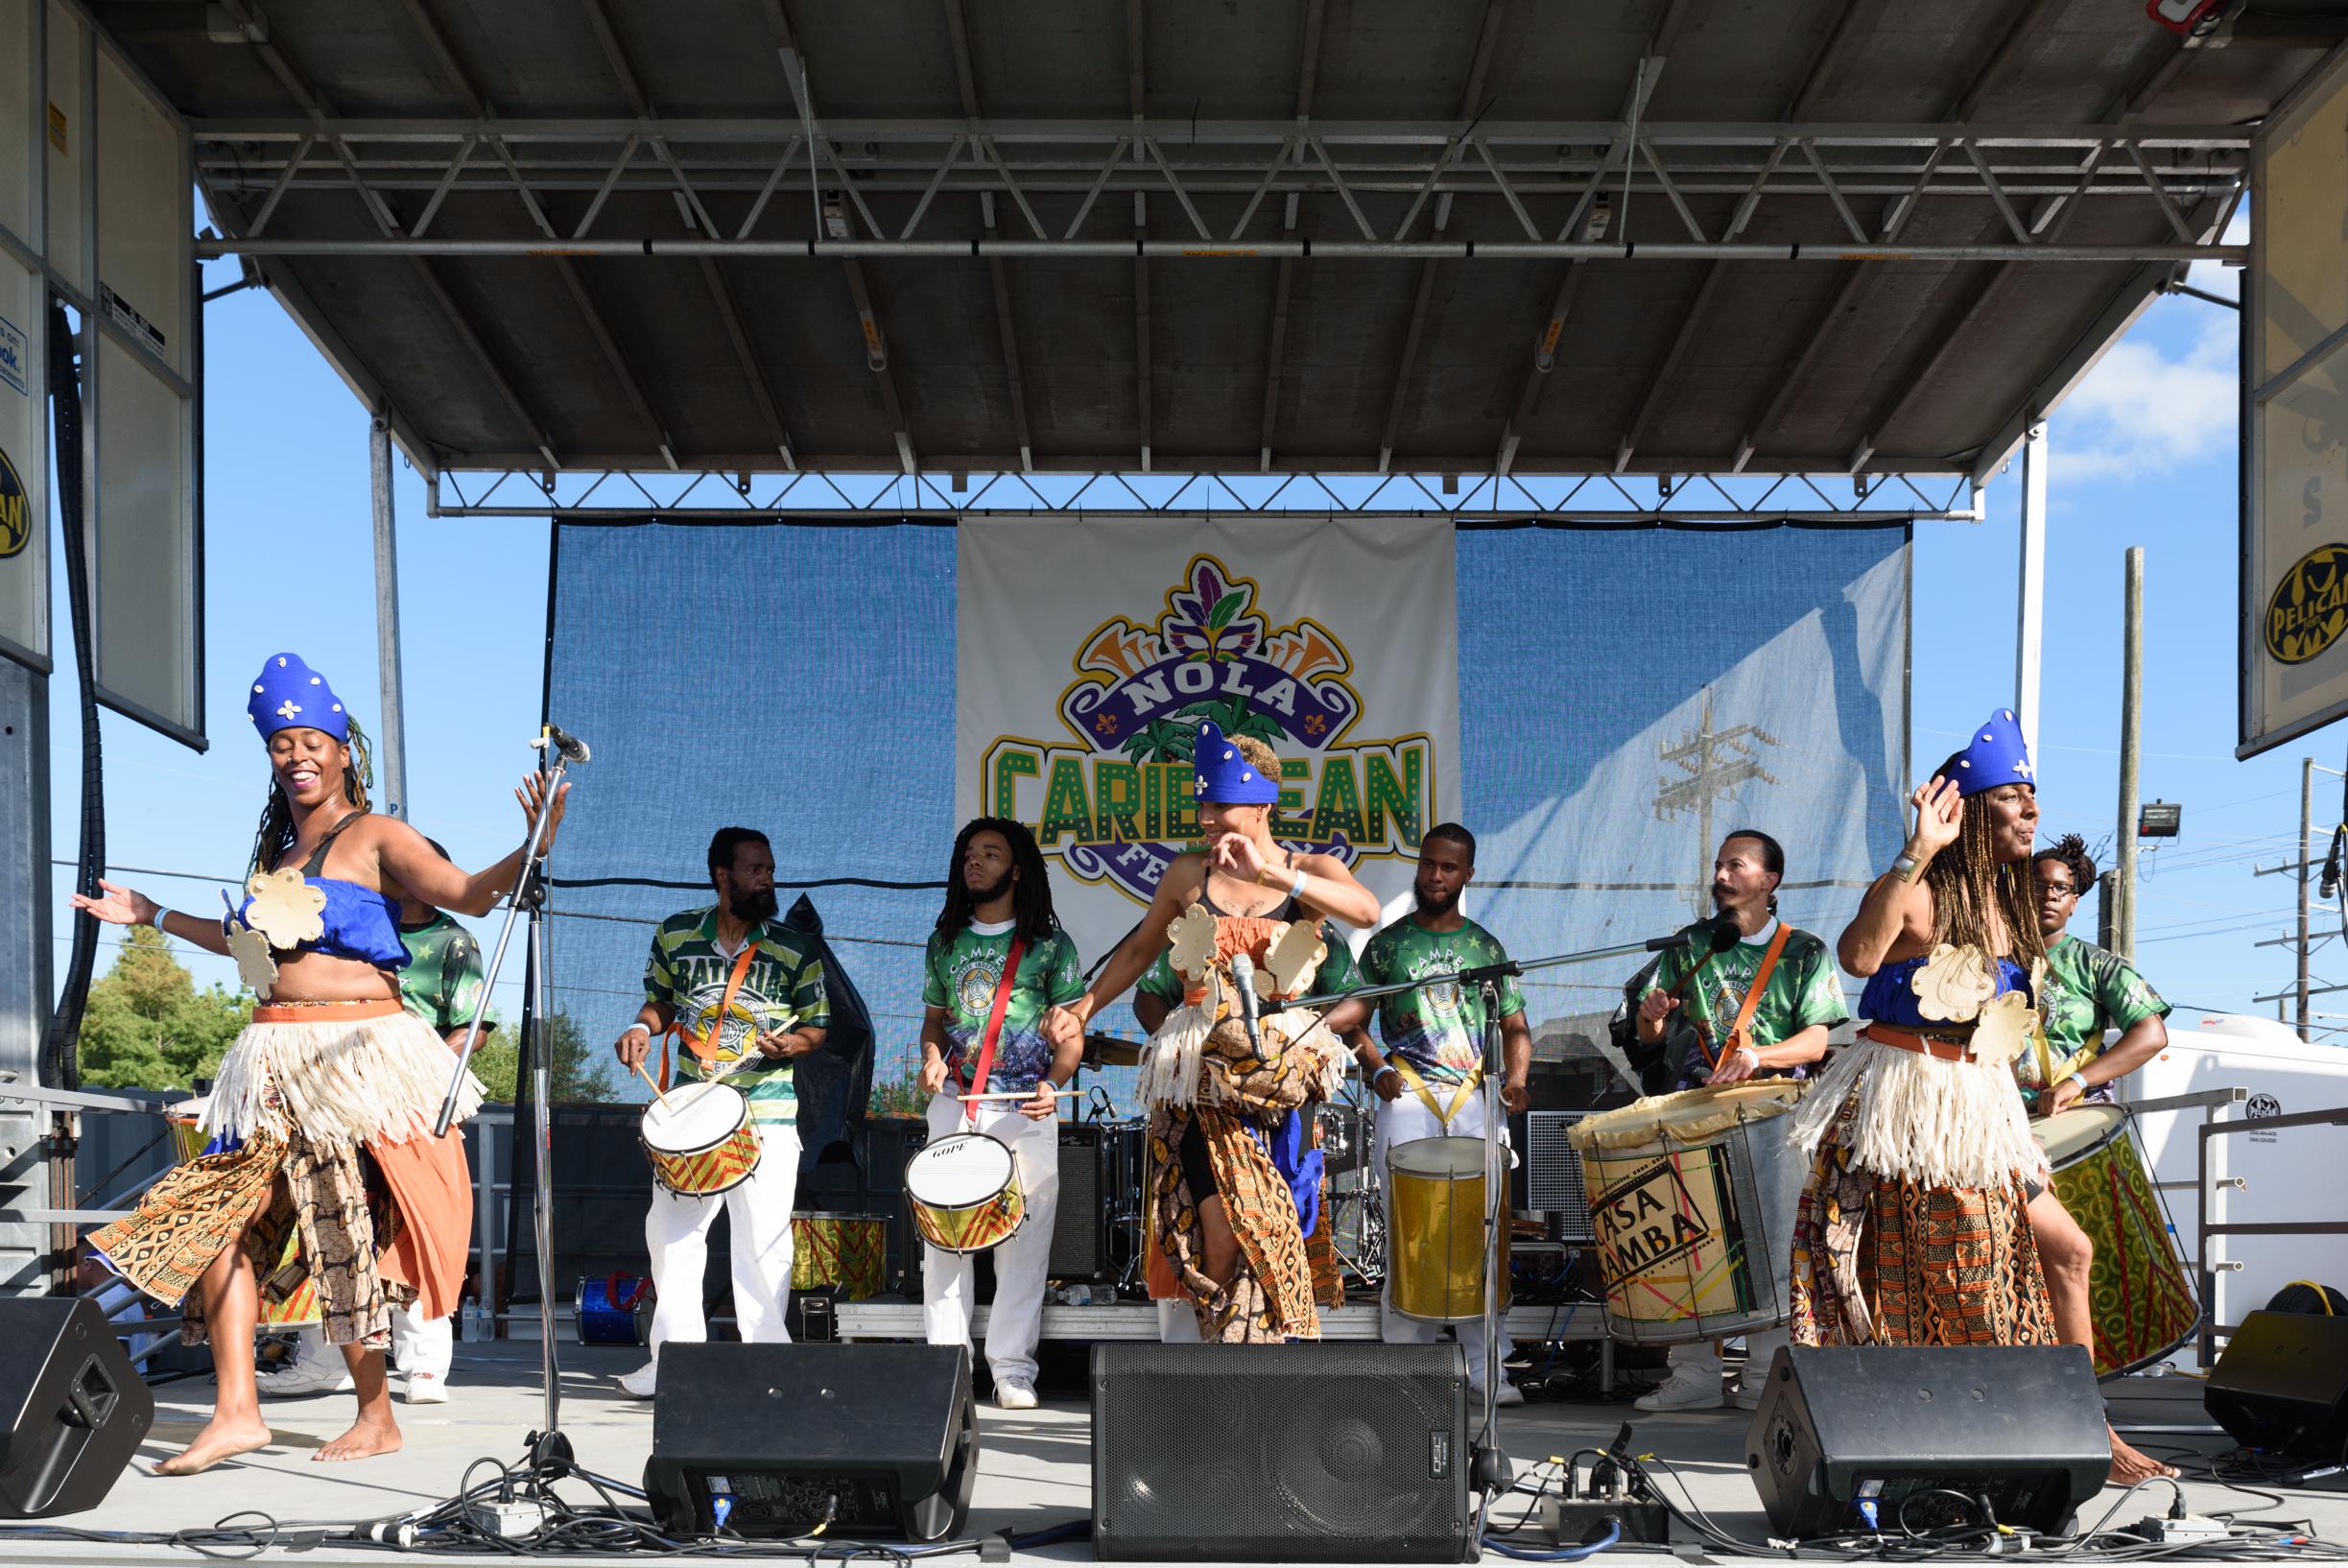 carnival new orleans nola caribbean festival soca reggae dance music